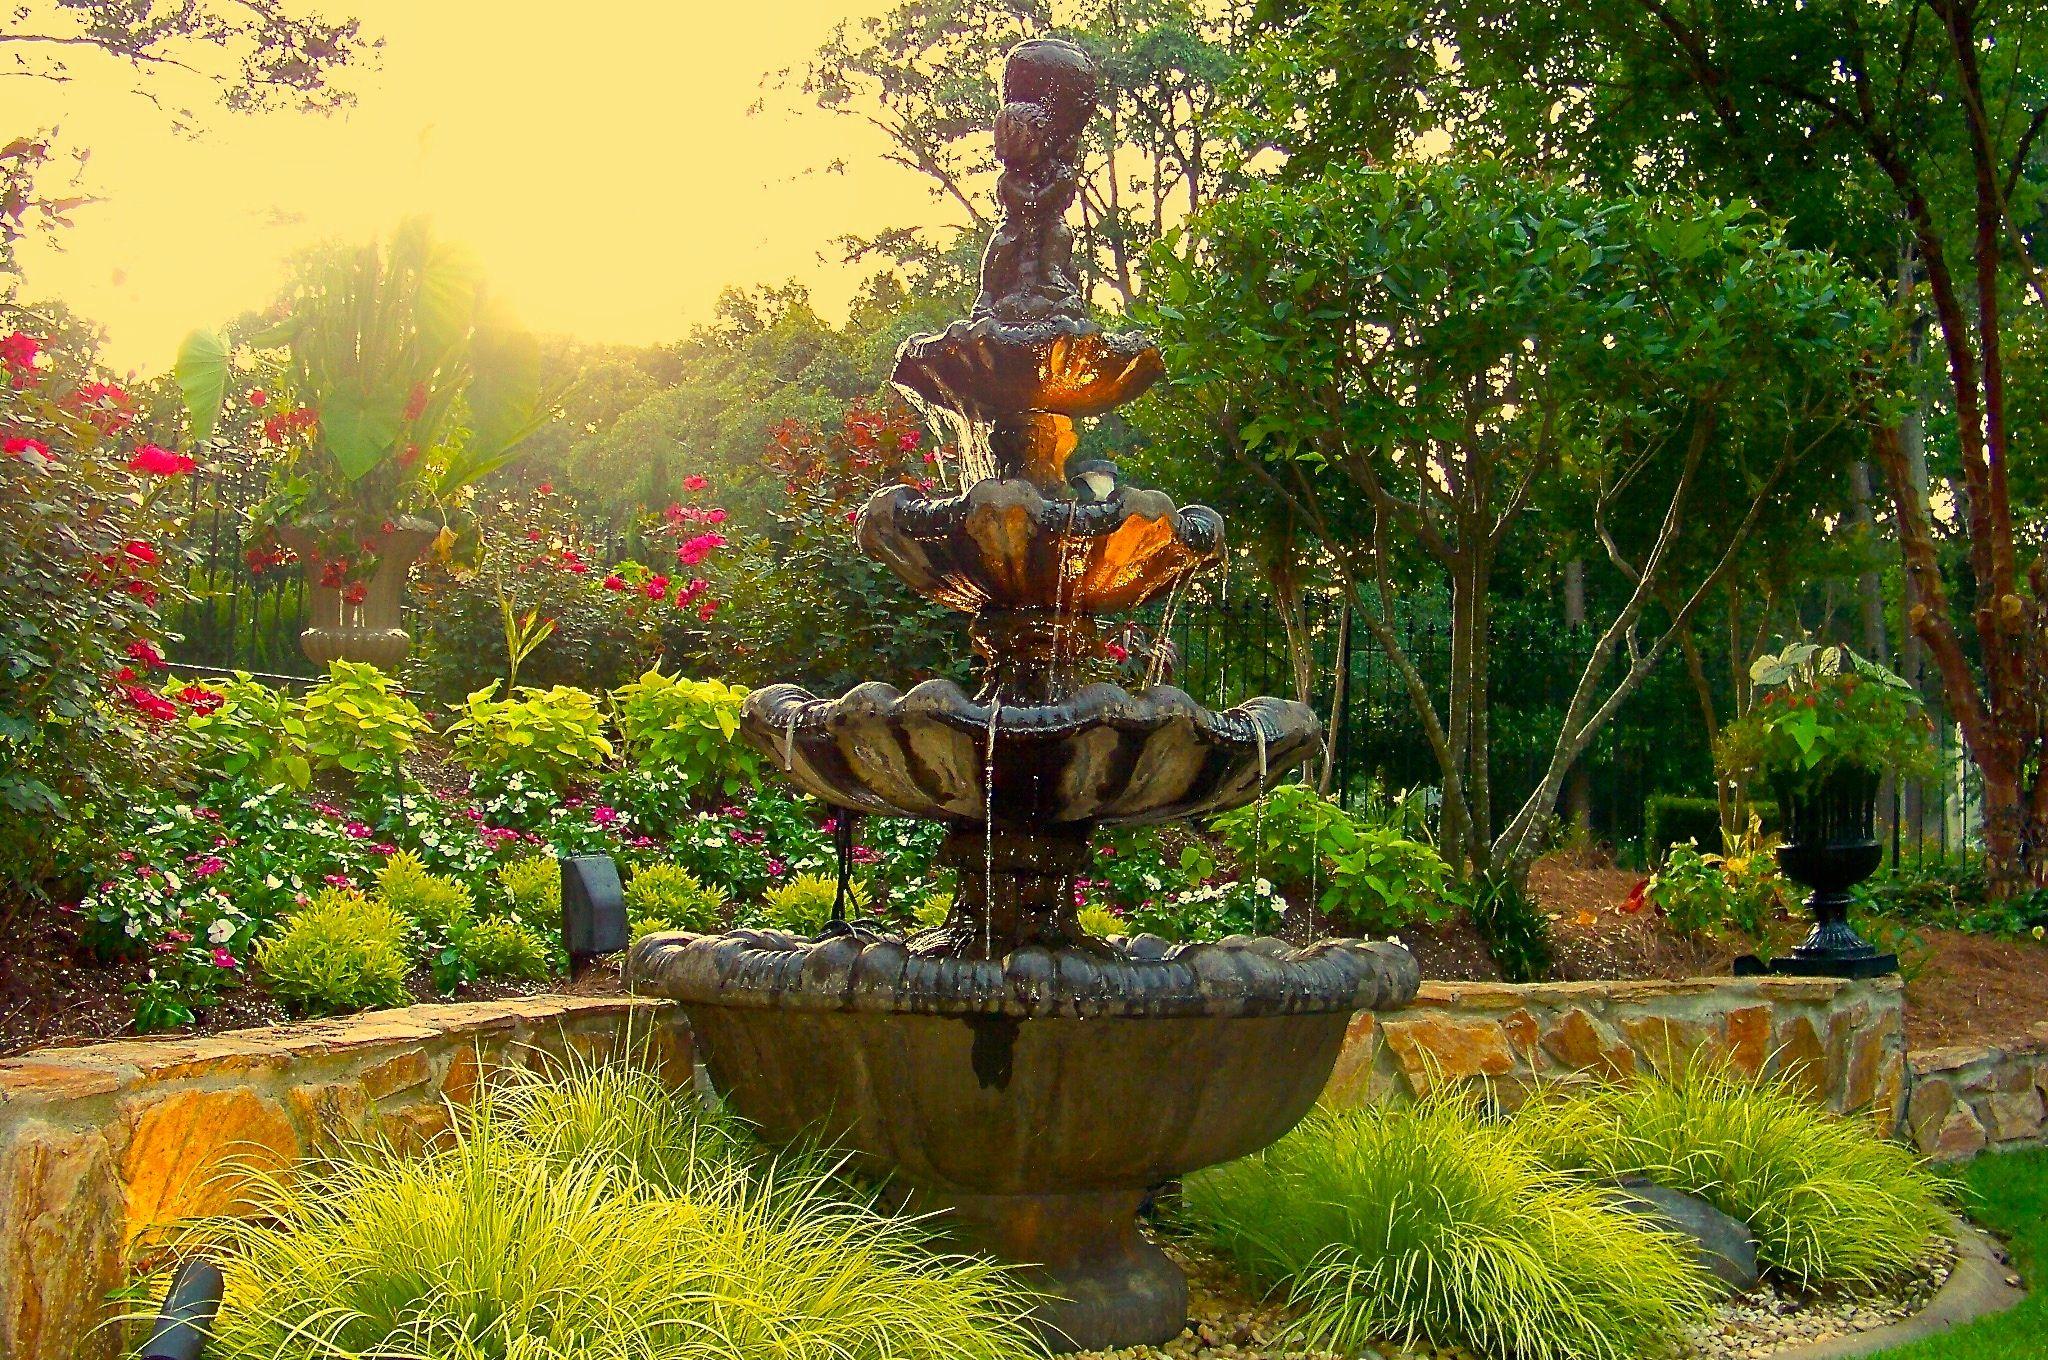 front yard fountain at dusk